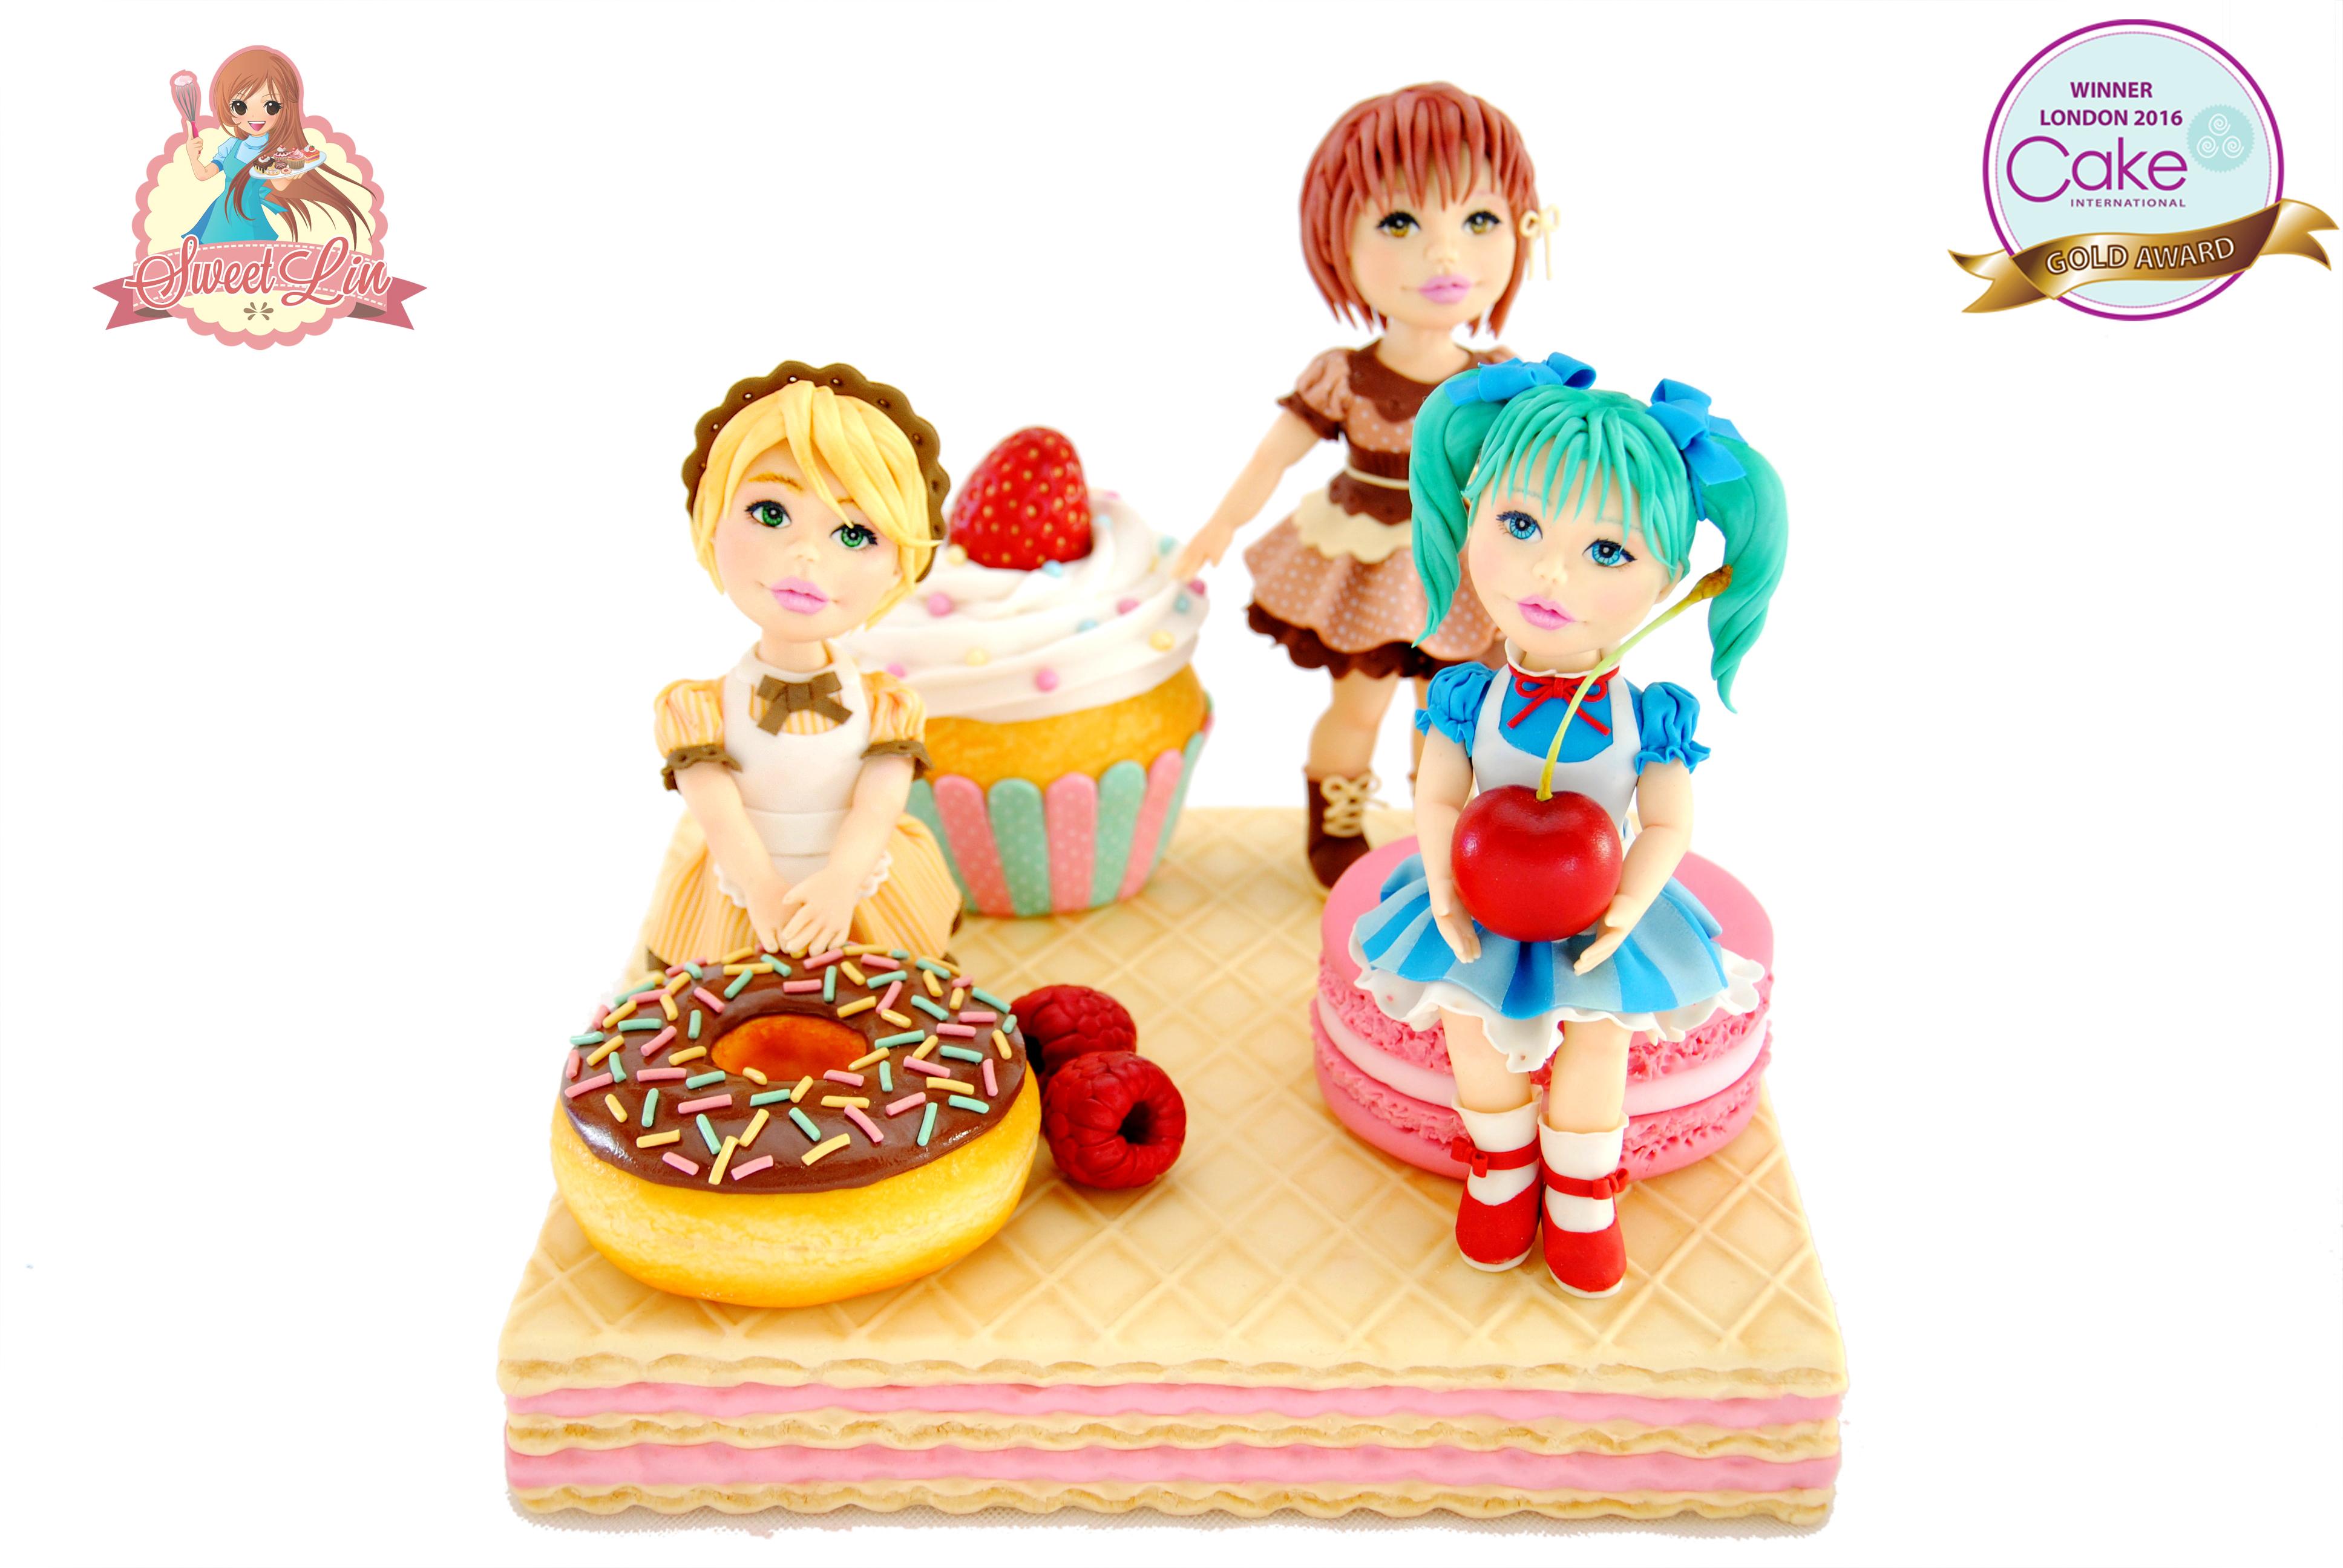 Little Girls eating donuts fondant Figurines